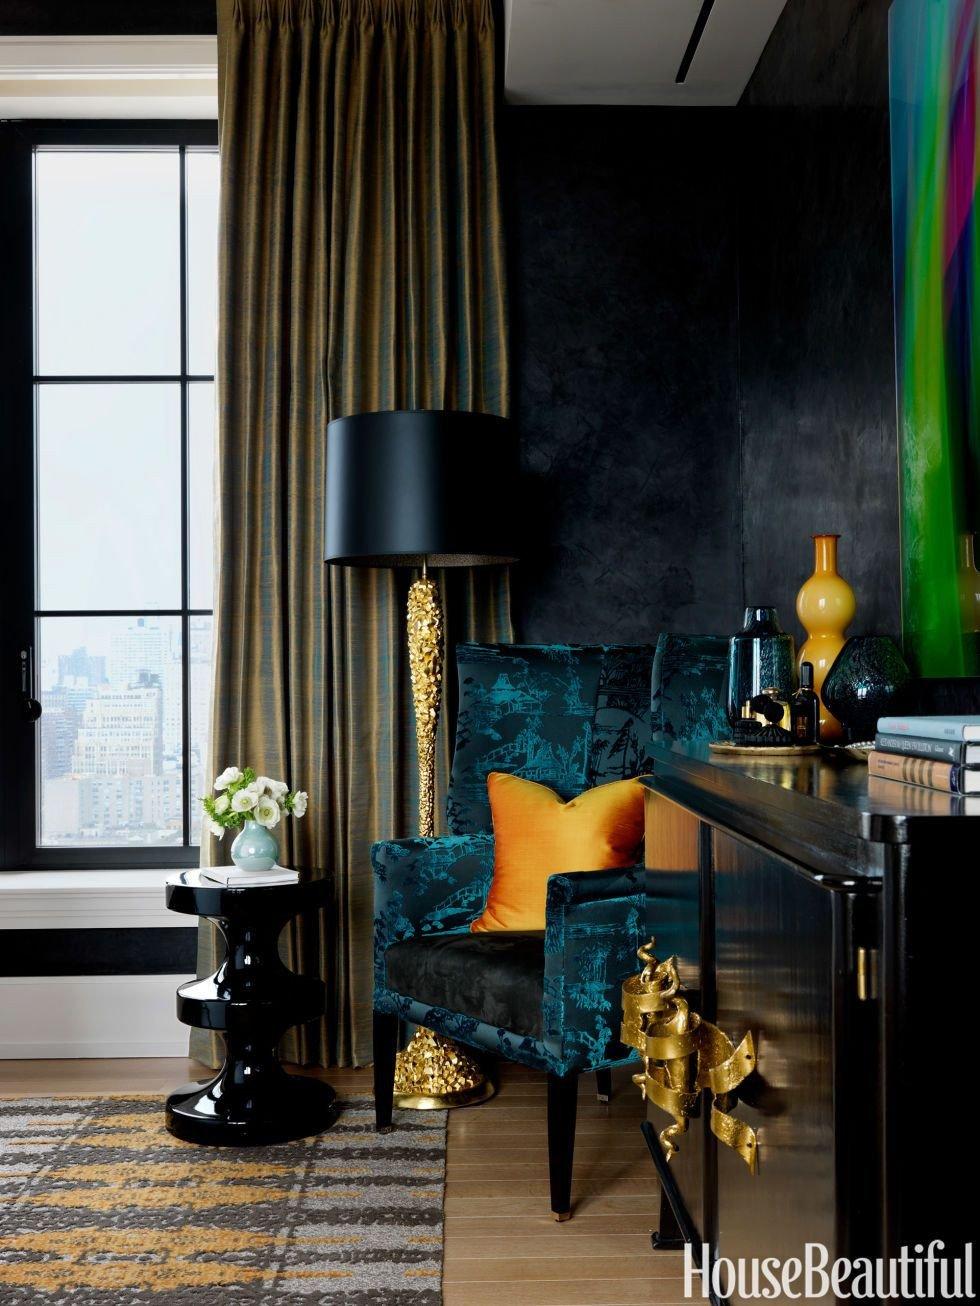 Teal and Black Bedroom Ideas Fresh Ceiling Inspiration Black Walls Teal Black Gold